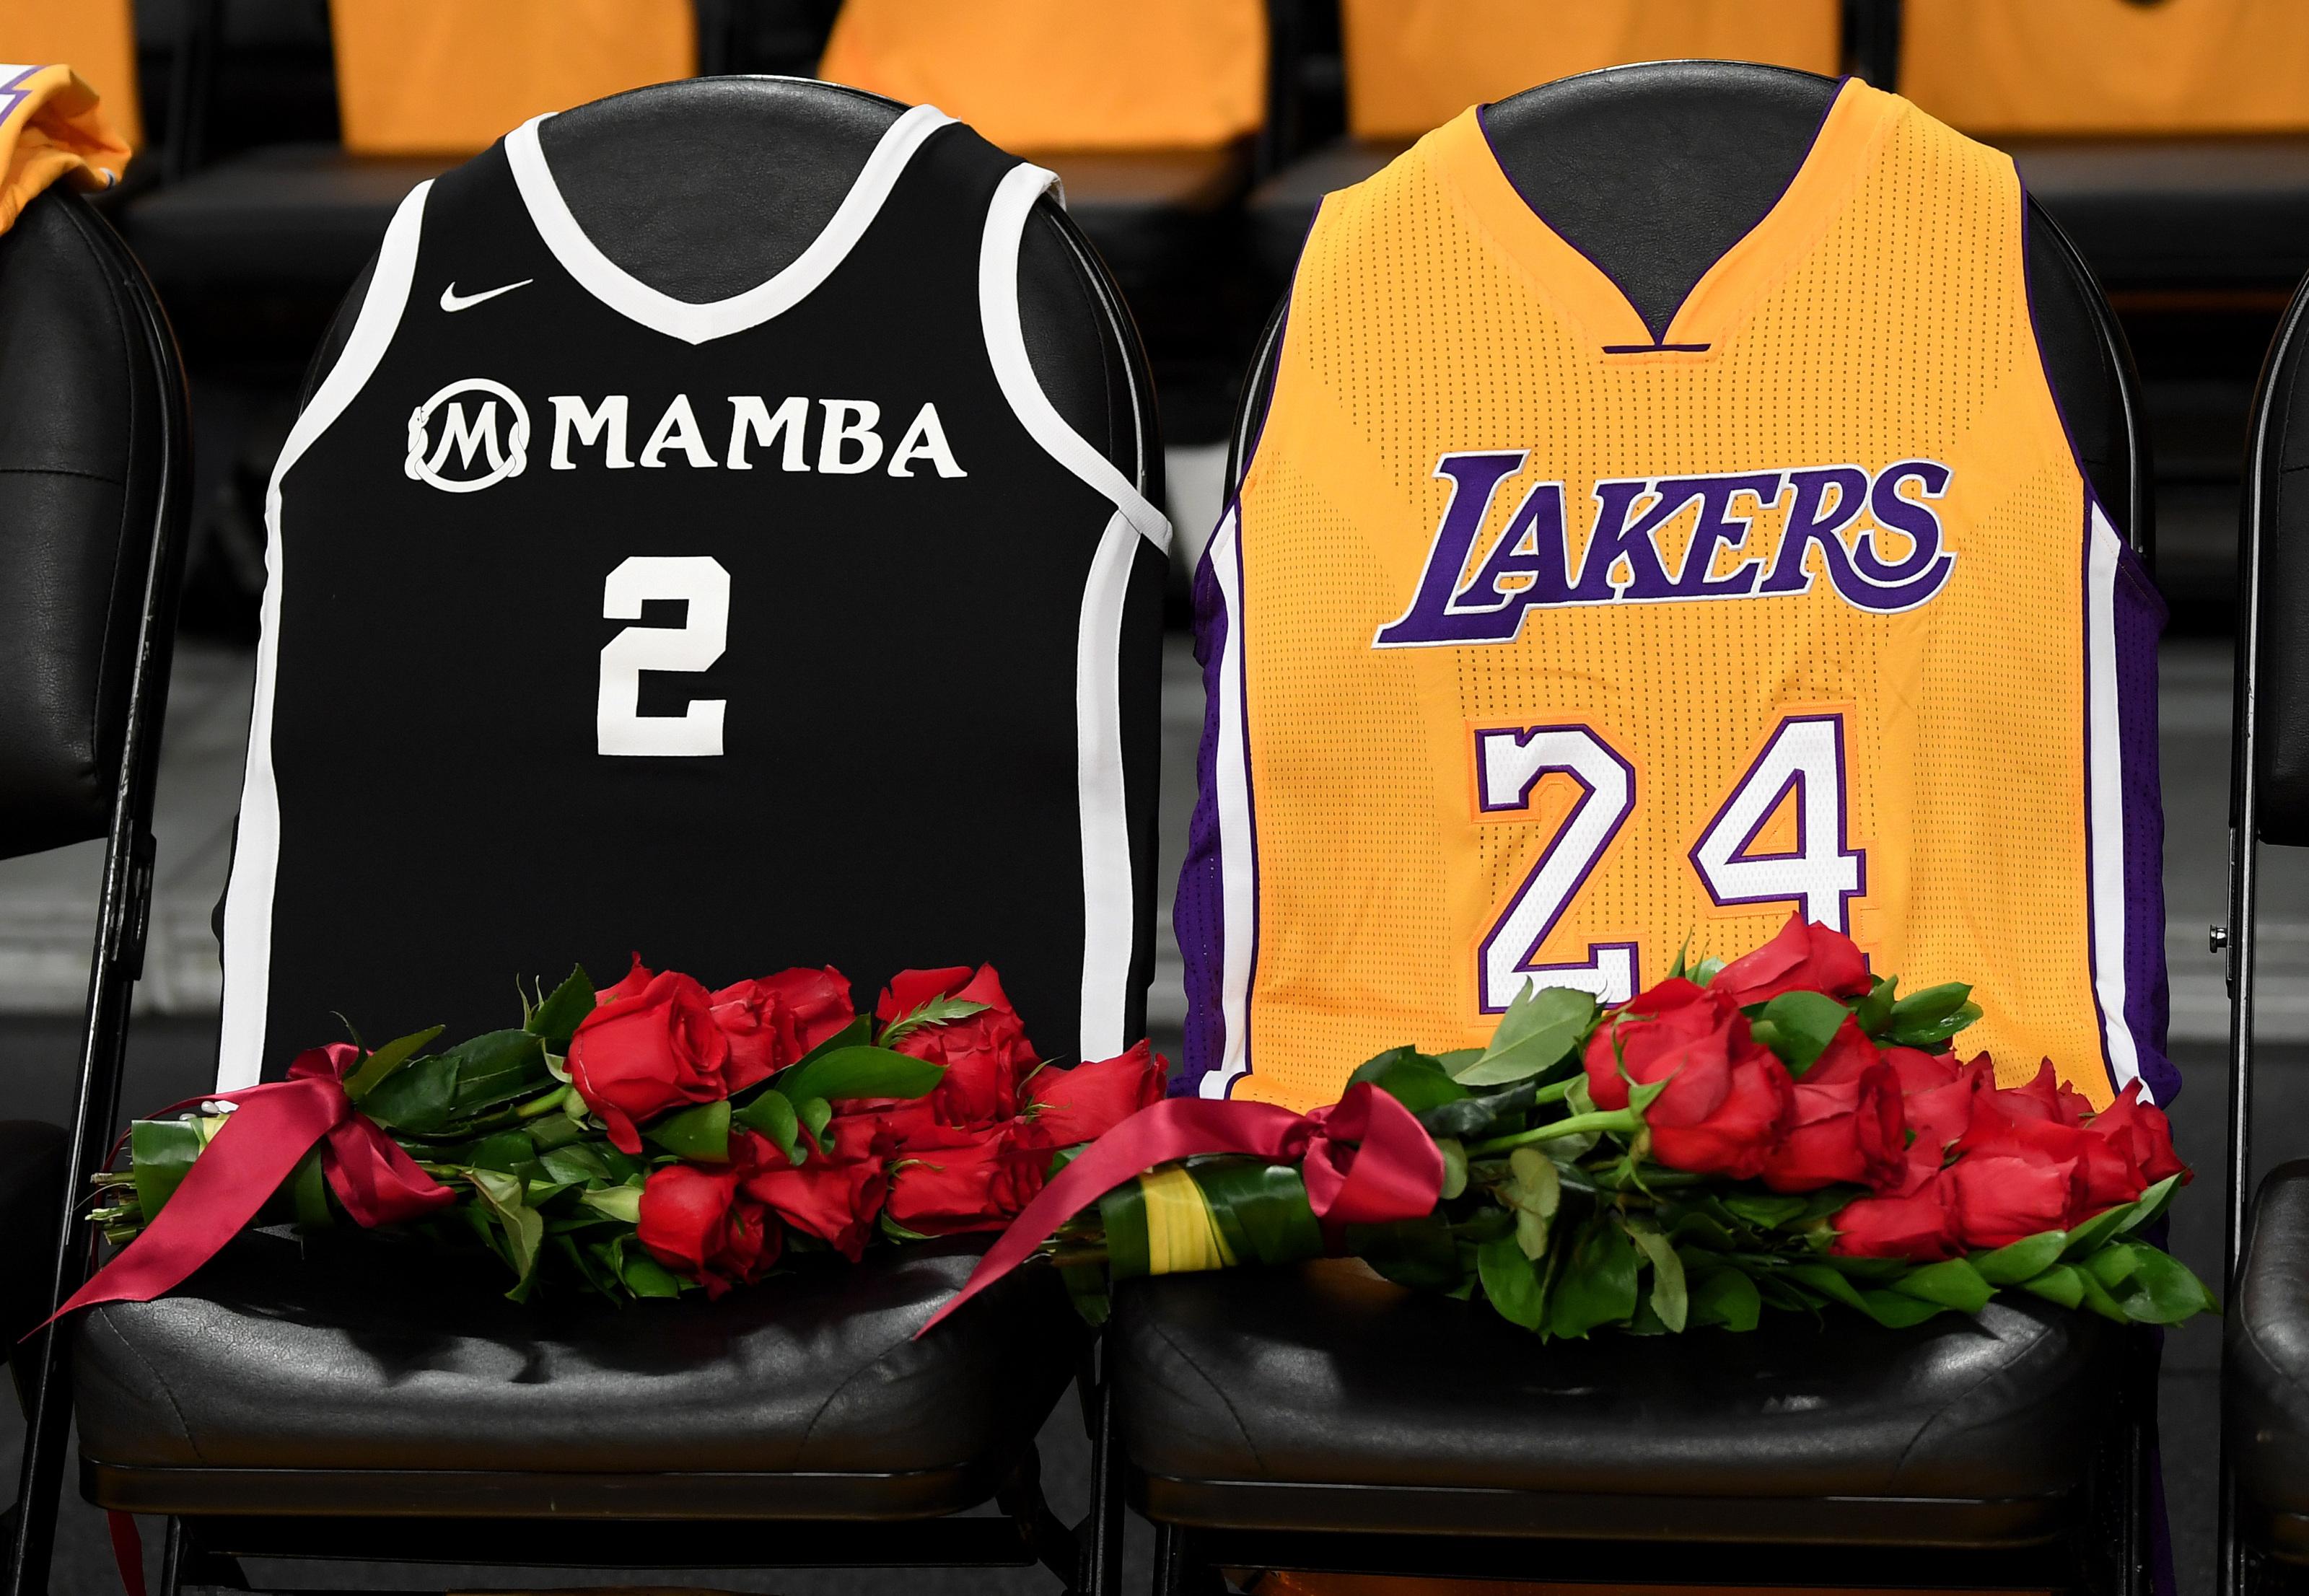 2020 NBA All-Star Game jerseys honor Kobe, Gianna Bryant, David Stern